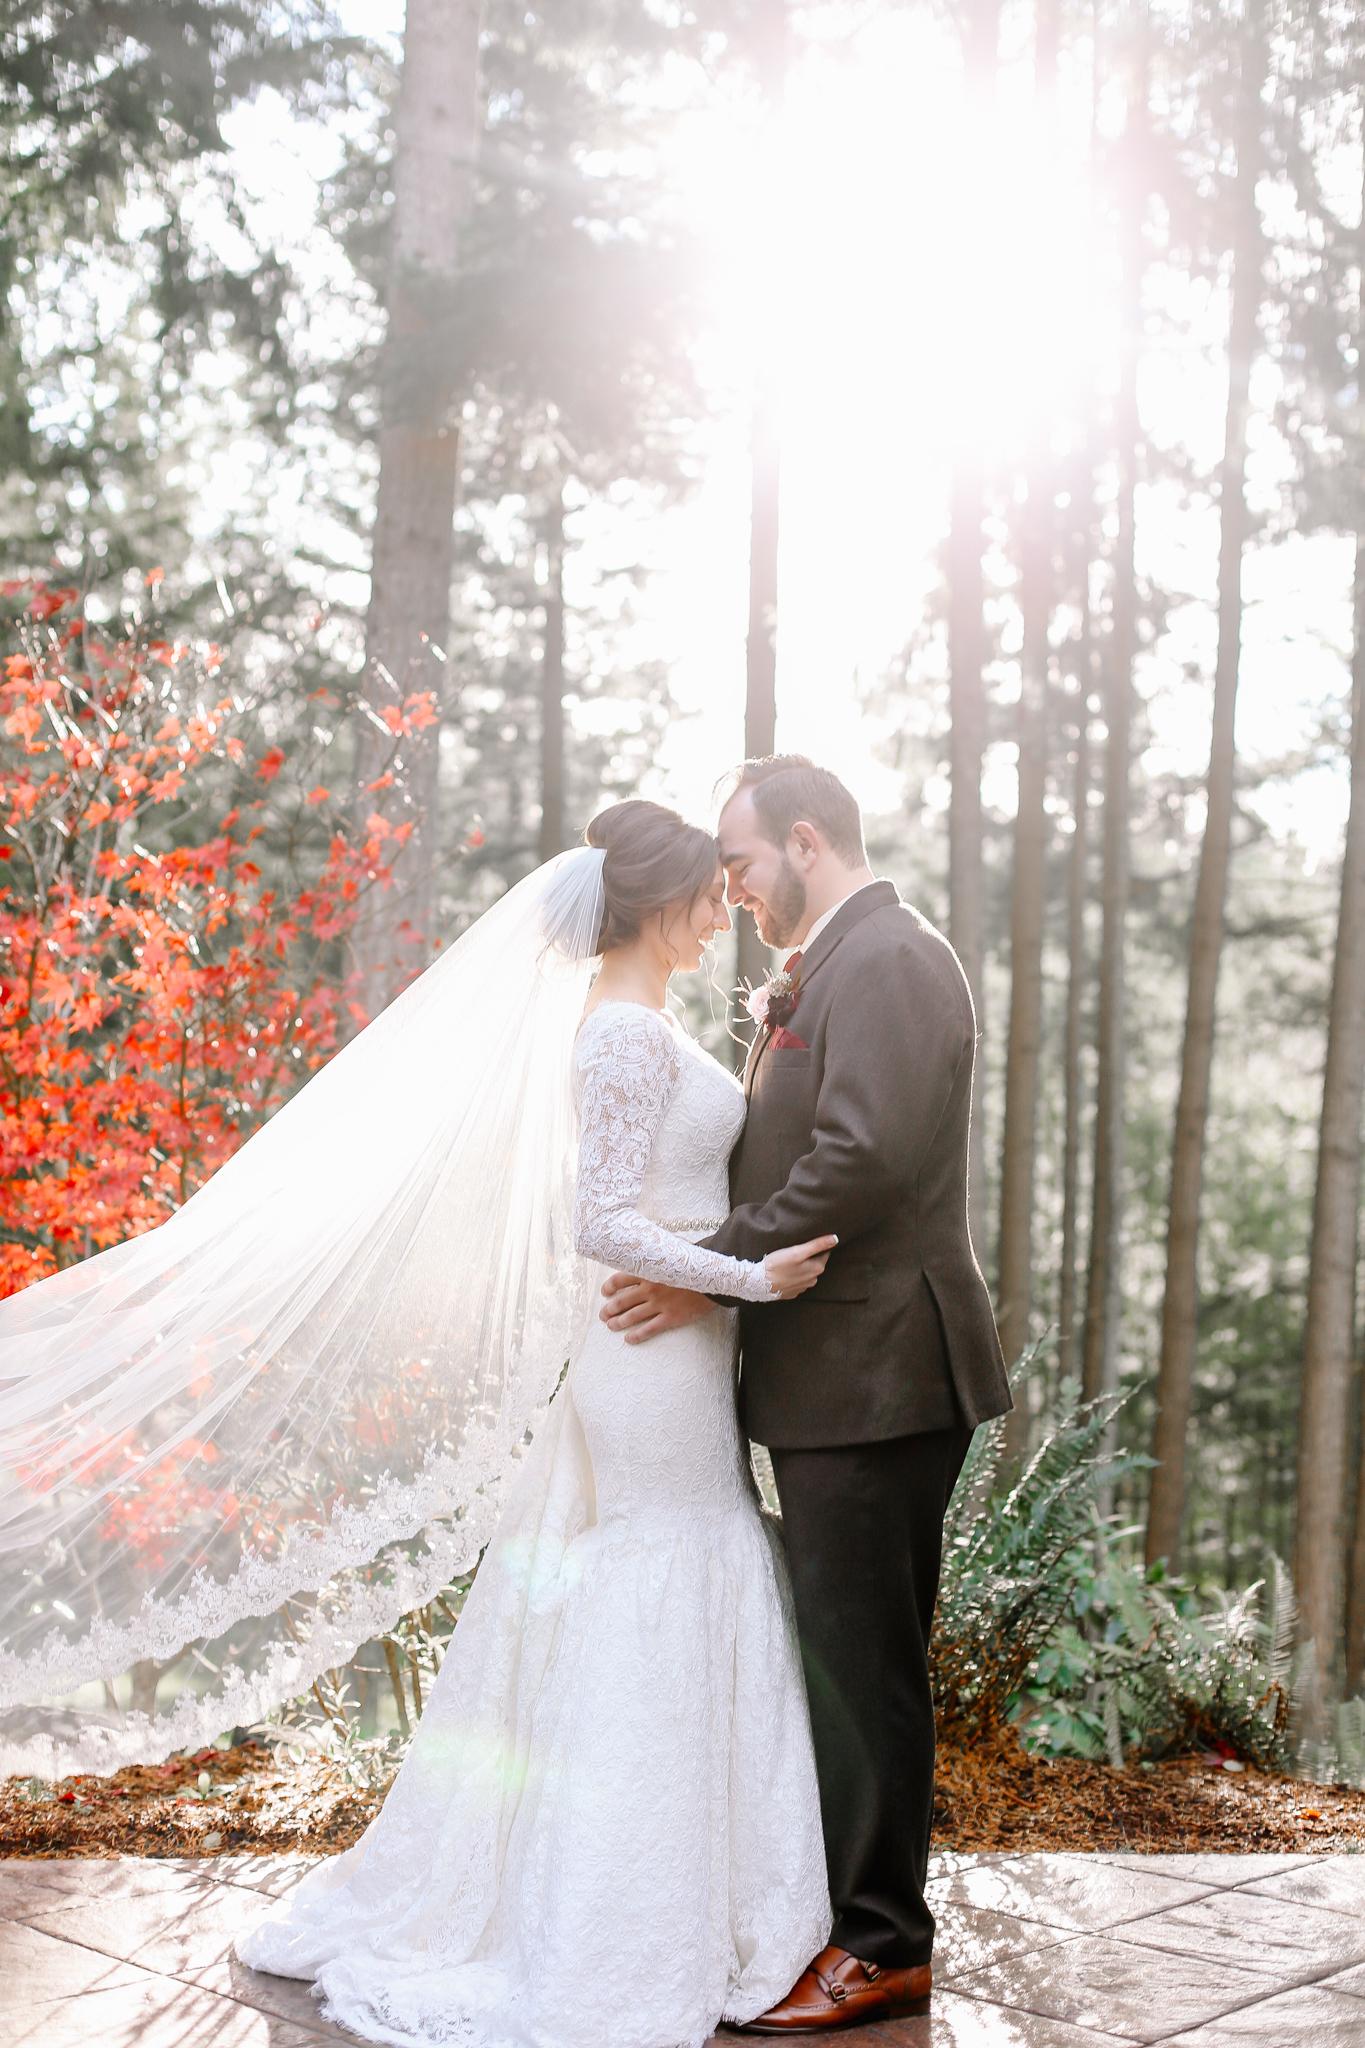 Manu and Laura - Portland Wedding Photographer - 35.jpg